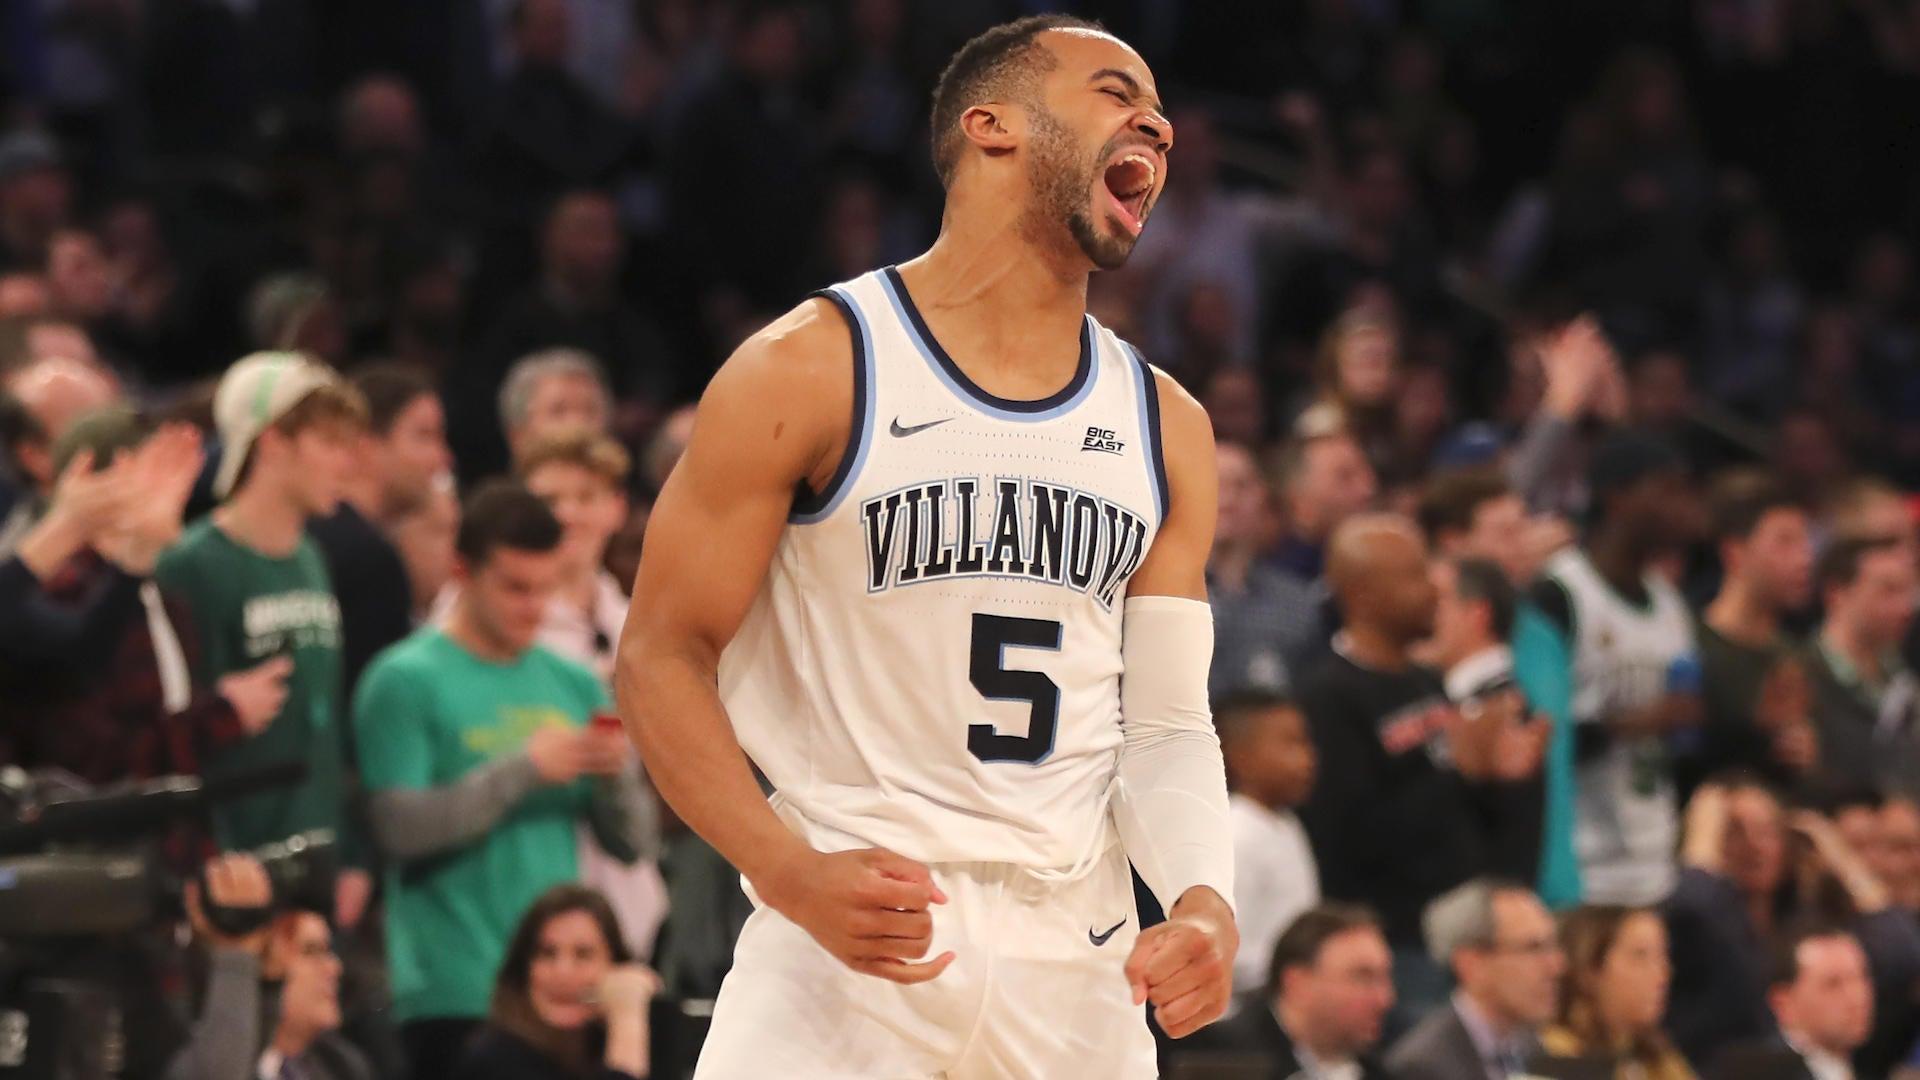 Villanova's outlook in the NCAA Tournament - CBSSports.com